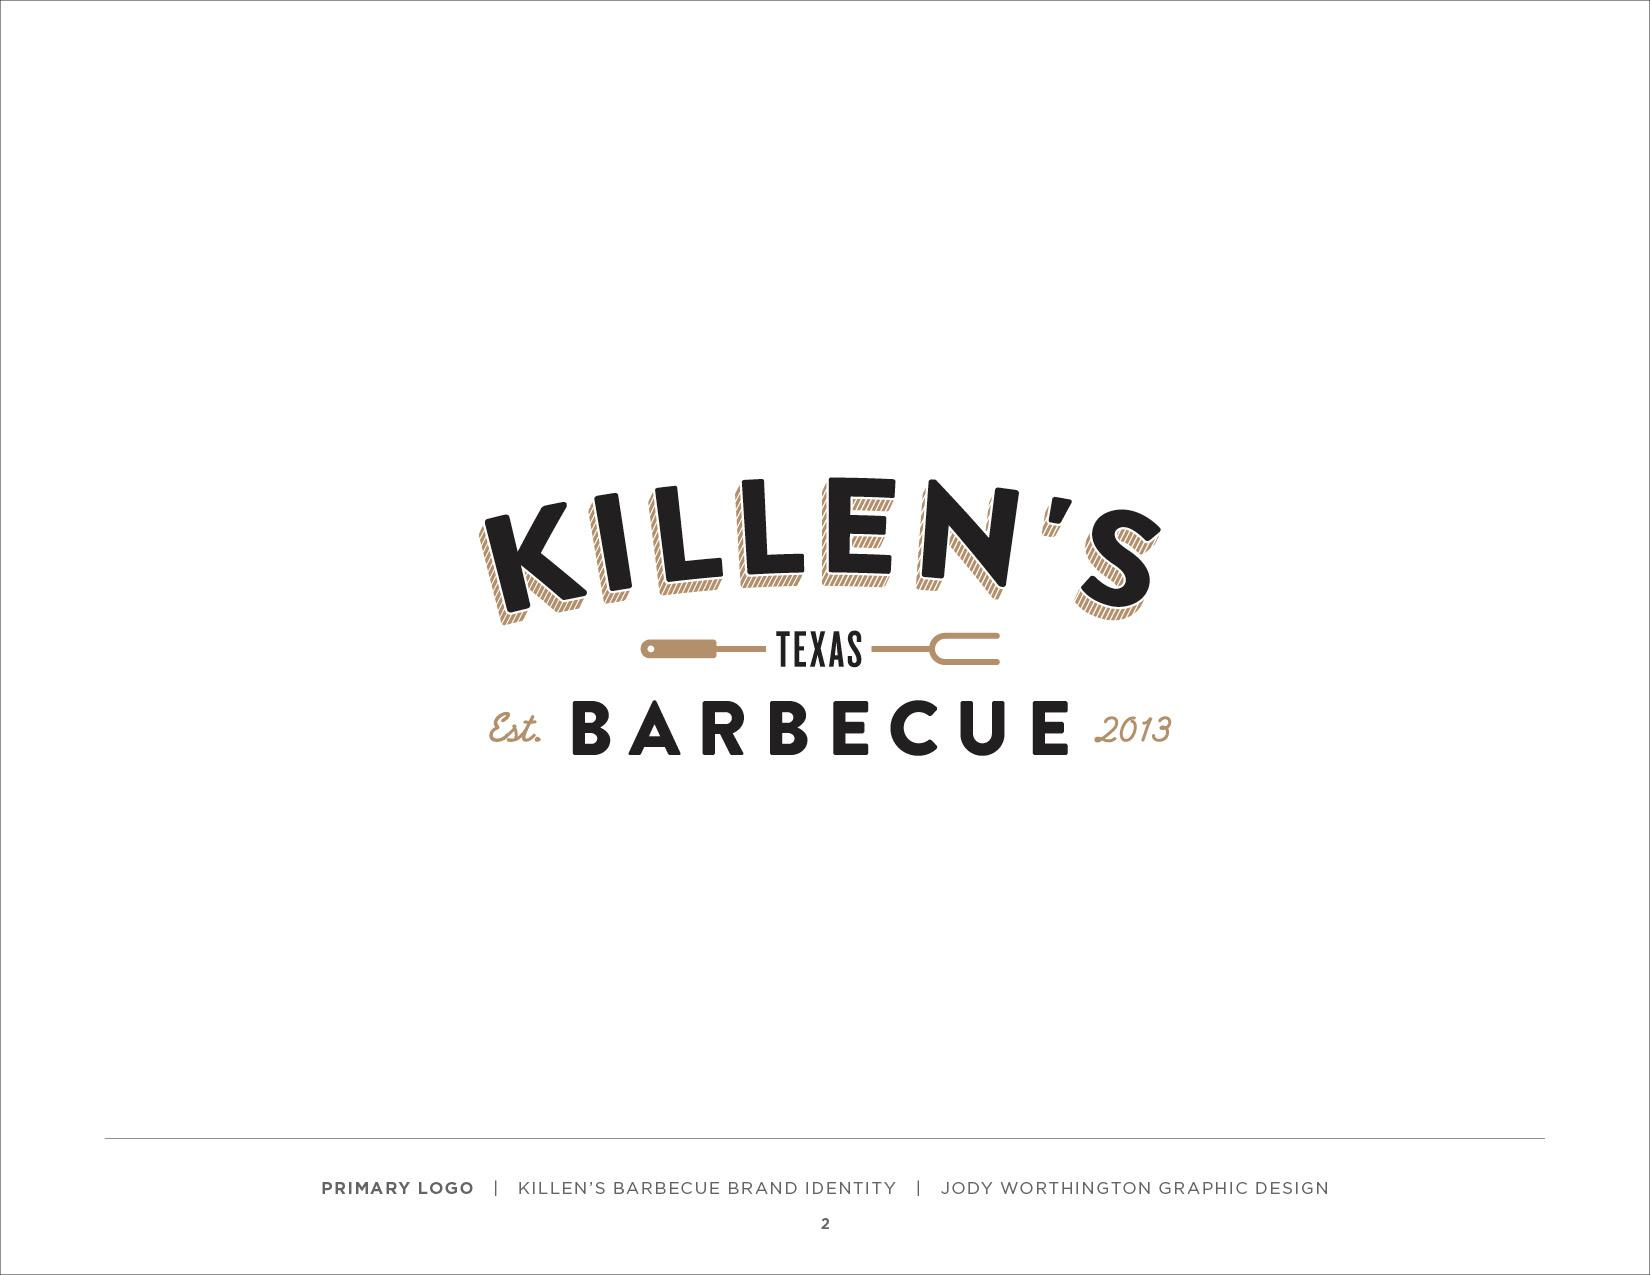 Killen's Barbecue - image 10 - student project